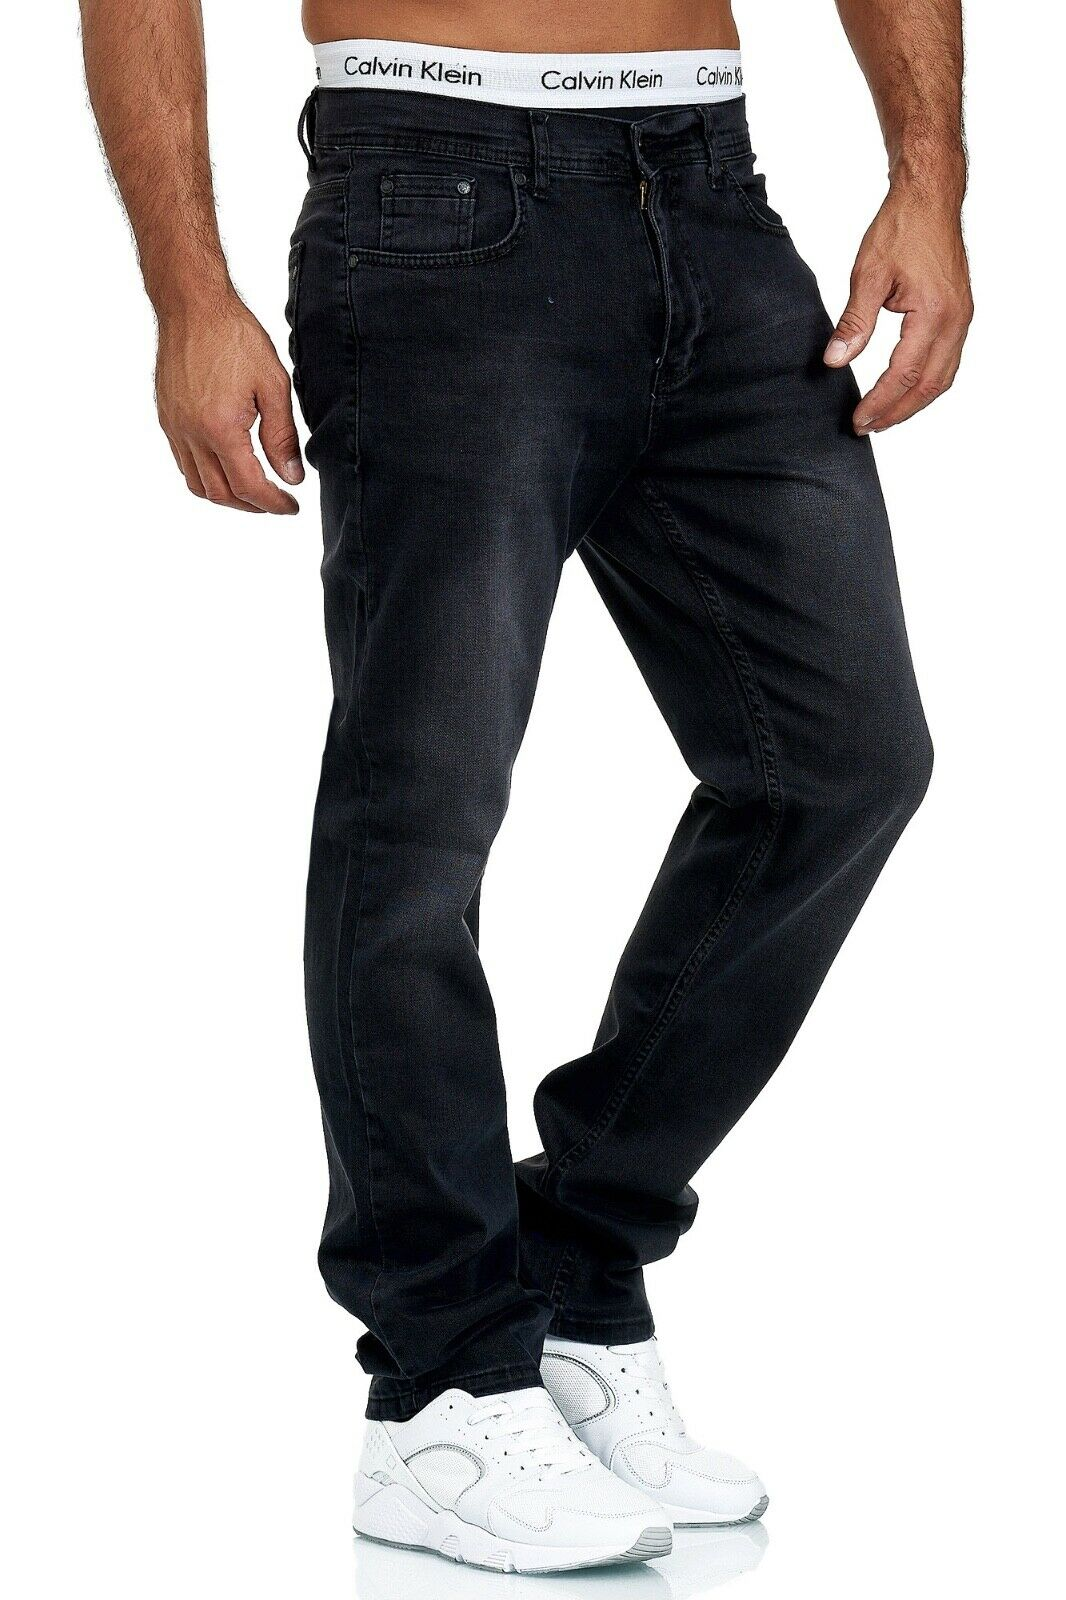 Herren-Jeans-Hose-Denim-KC-Black-Washed-Straight-Cut-Regular-Dicke-Naht-naehte Indexbild 53